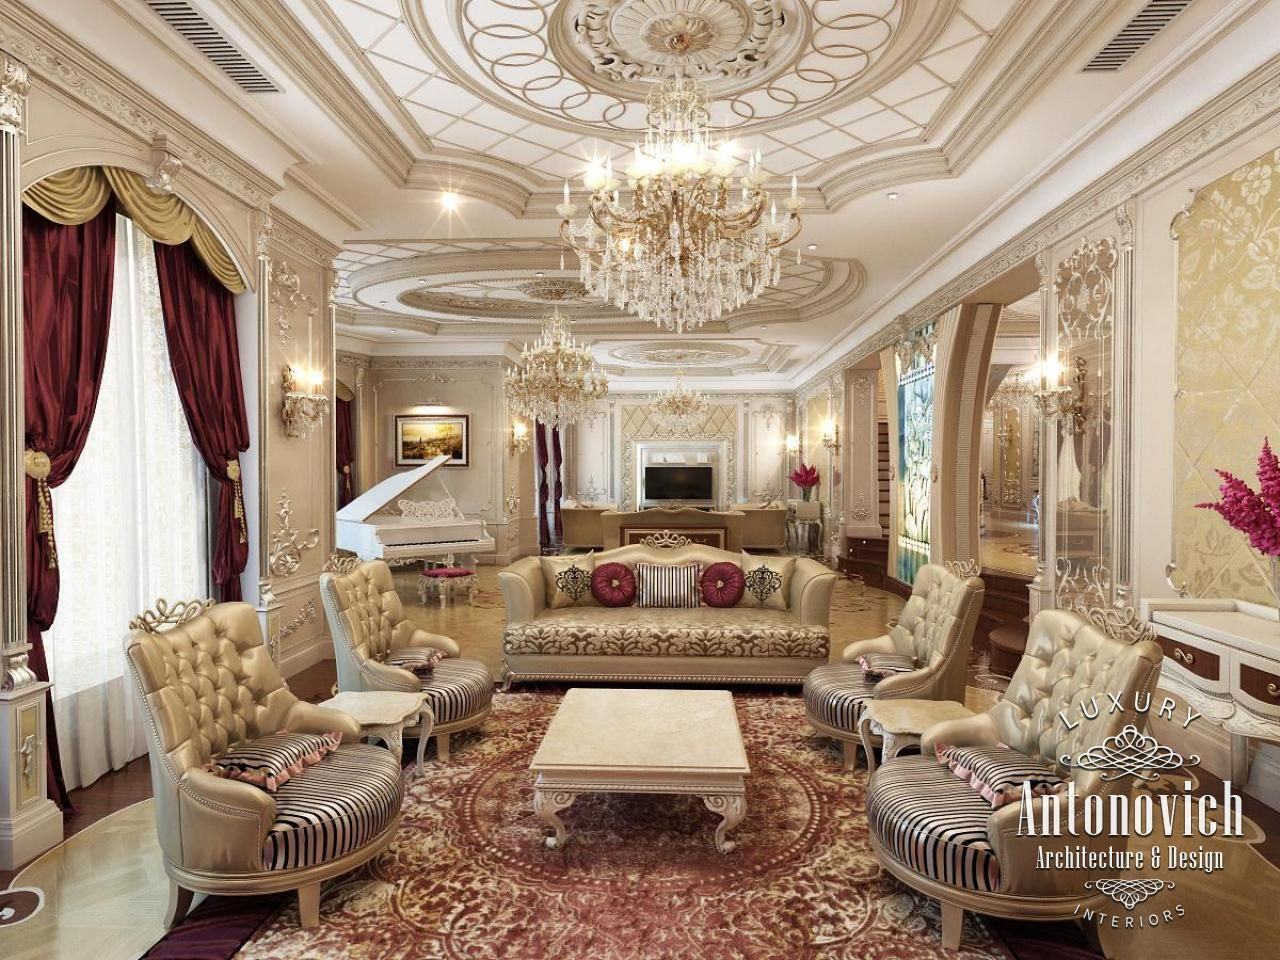 Luxus Villa Interieur Design Loungembel berprfen